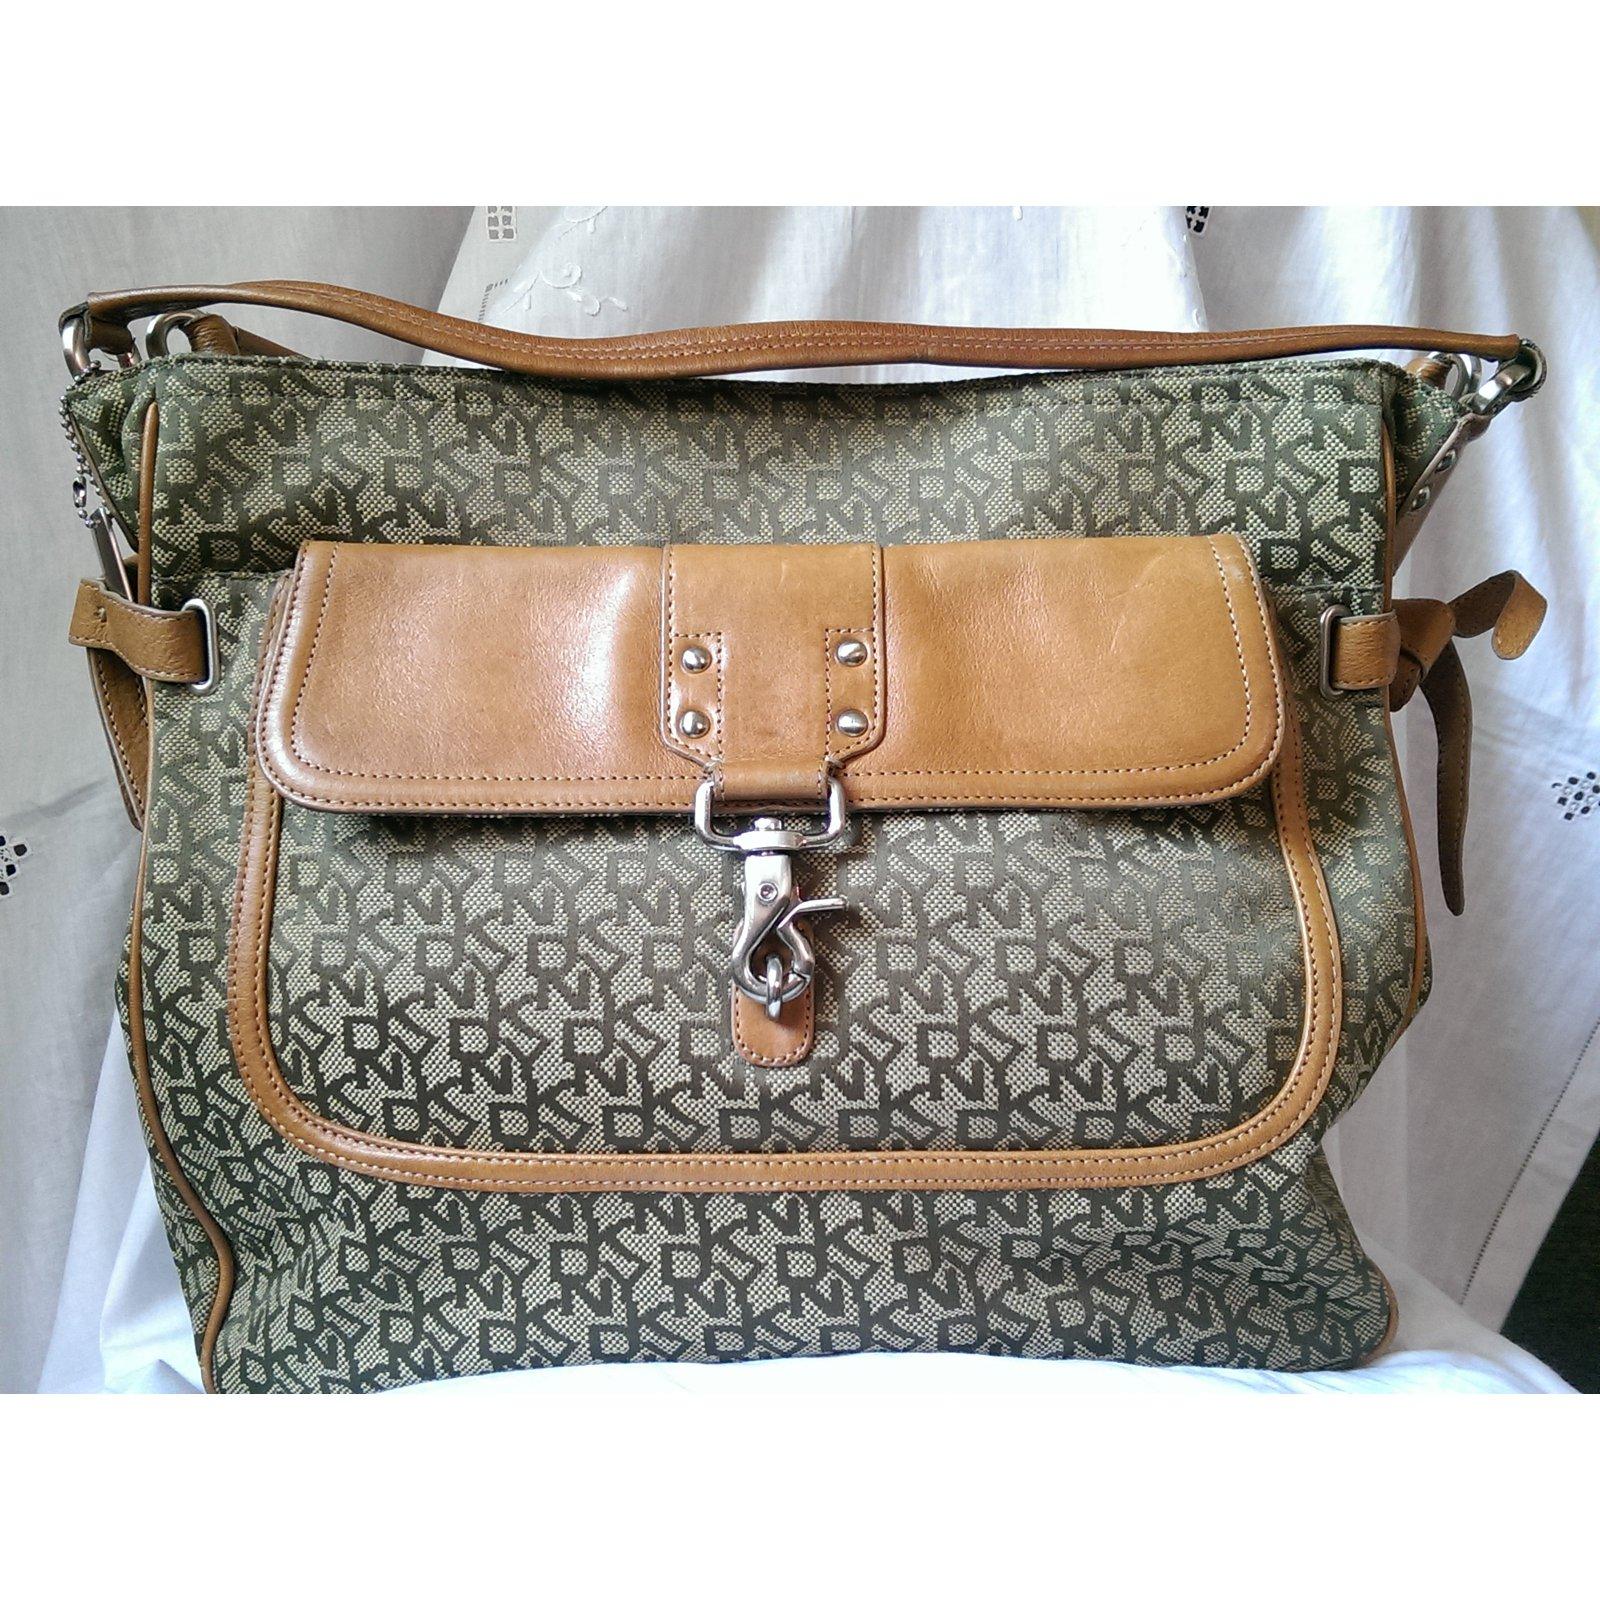 Dkny Handbag Handbags Leather Cotton